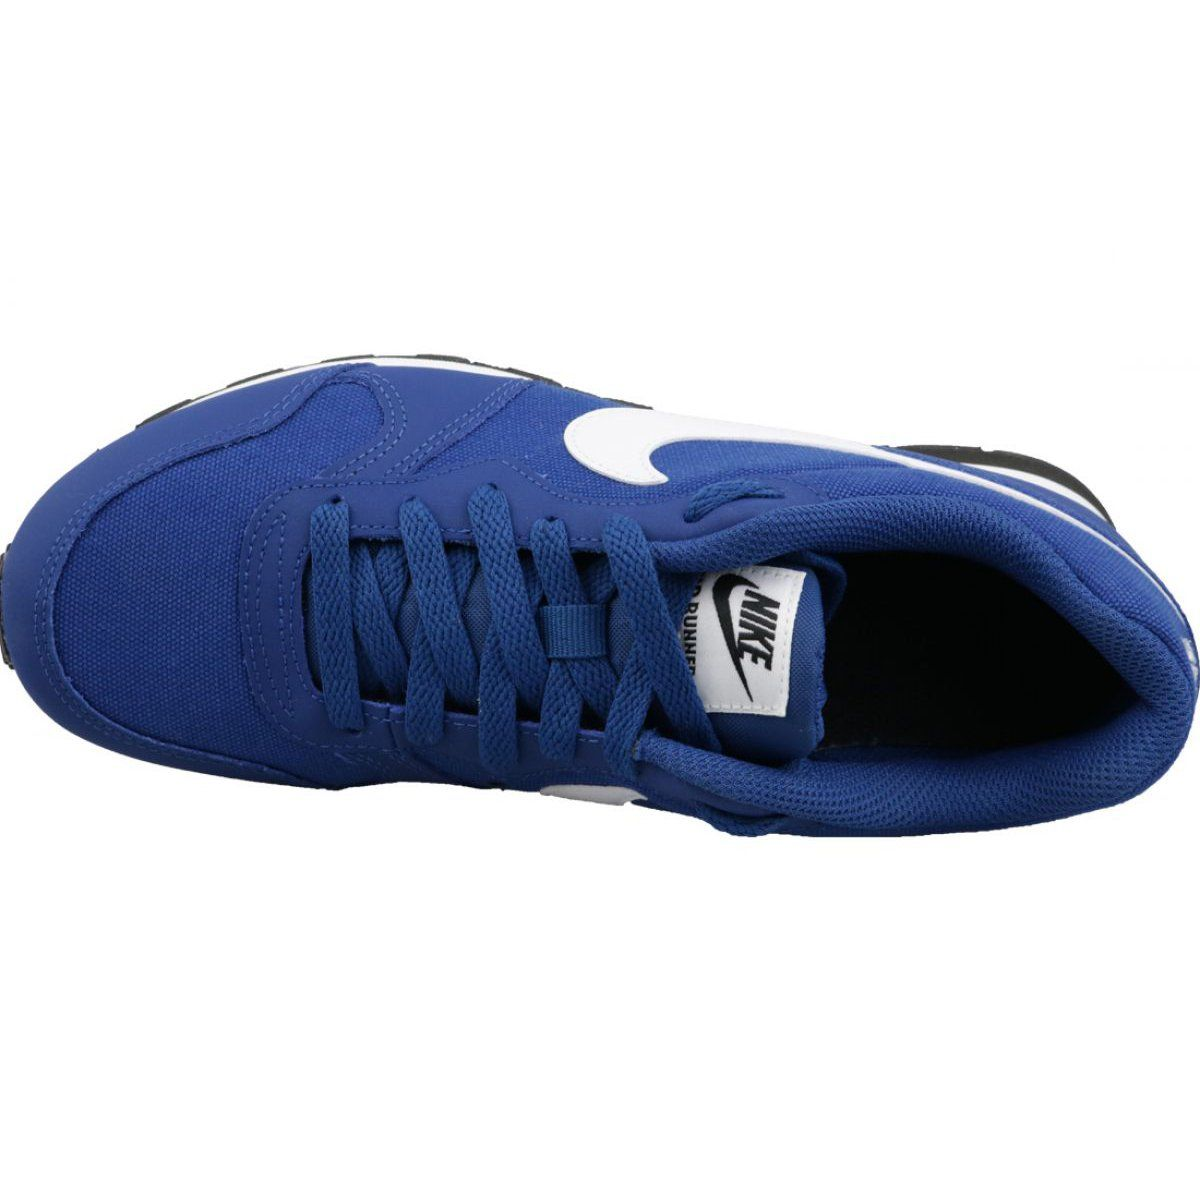 Buty Nike Md Runner 2 Gs Jr 807316 411 Niebieskie Nike Shoes Women Blue Shoes Nike